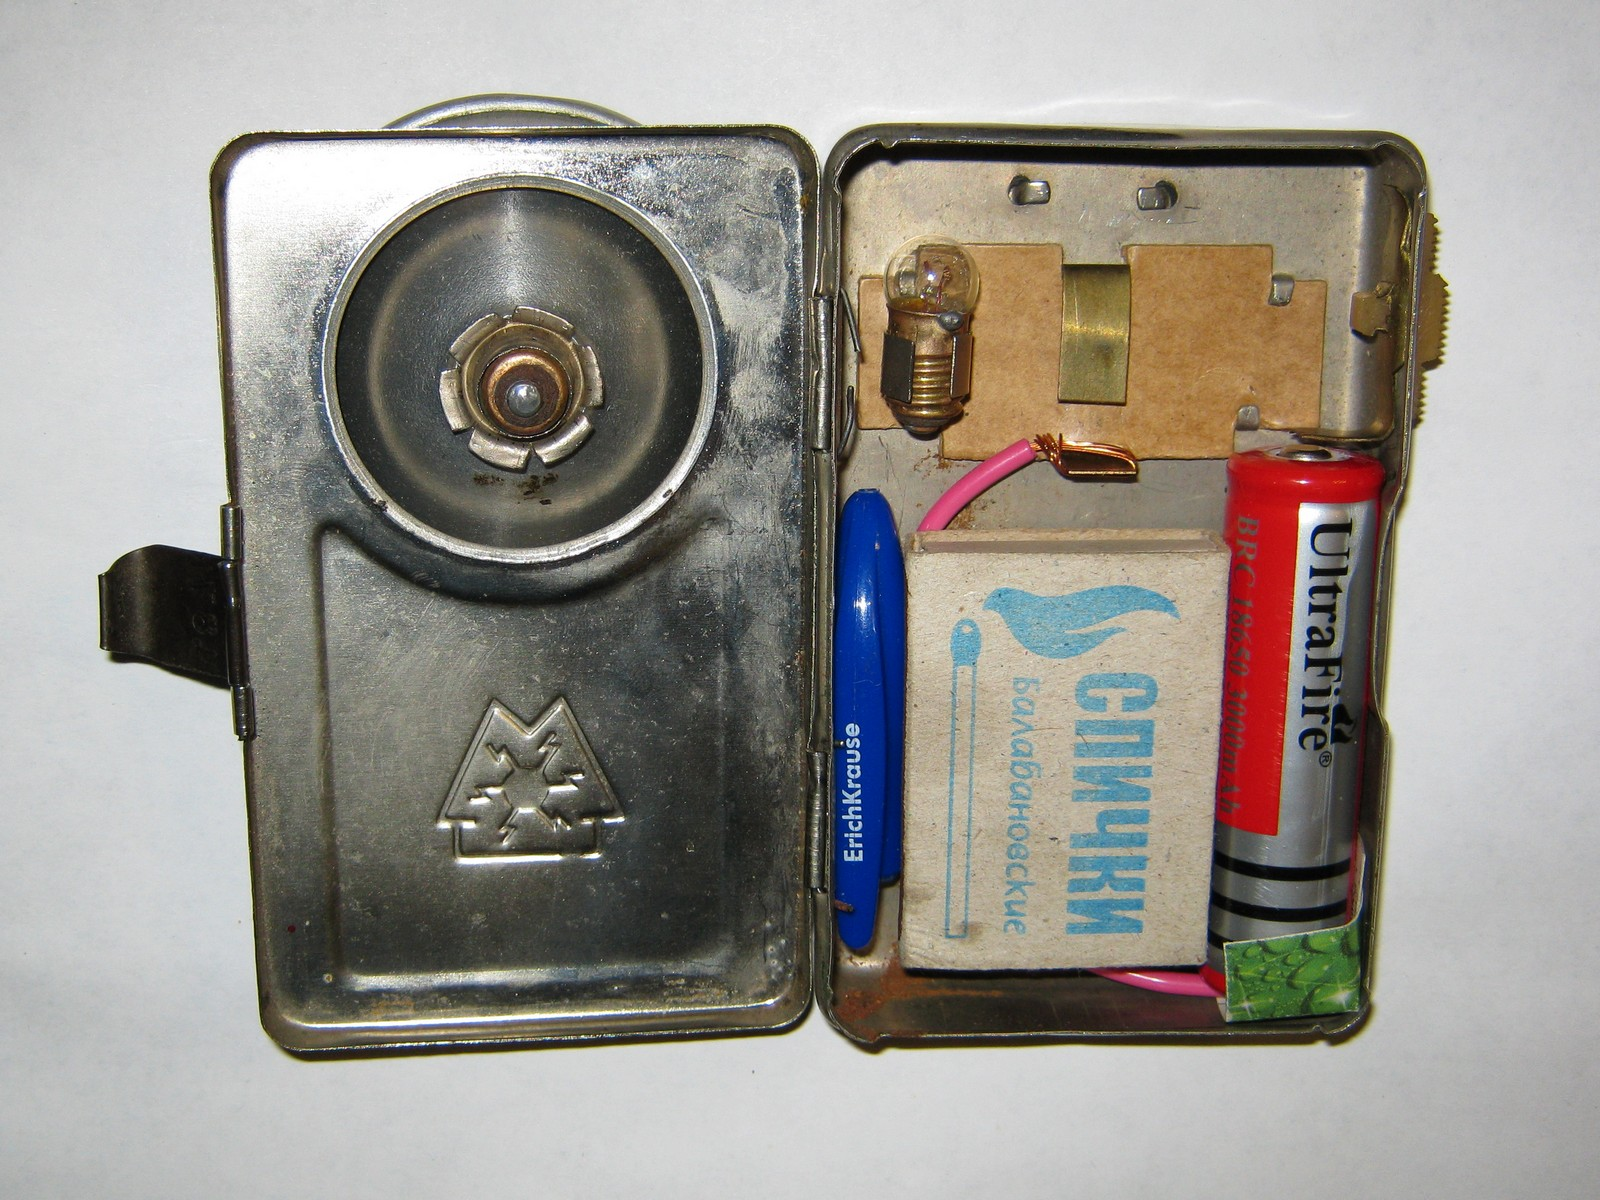 84 2s2p 74v 18650 Holder With Battery Buildin Pcm Protection Circuit Http Fotkideporu Photo 777460 51057m20o0jvwn1 Thexj2az6u 948284